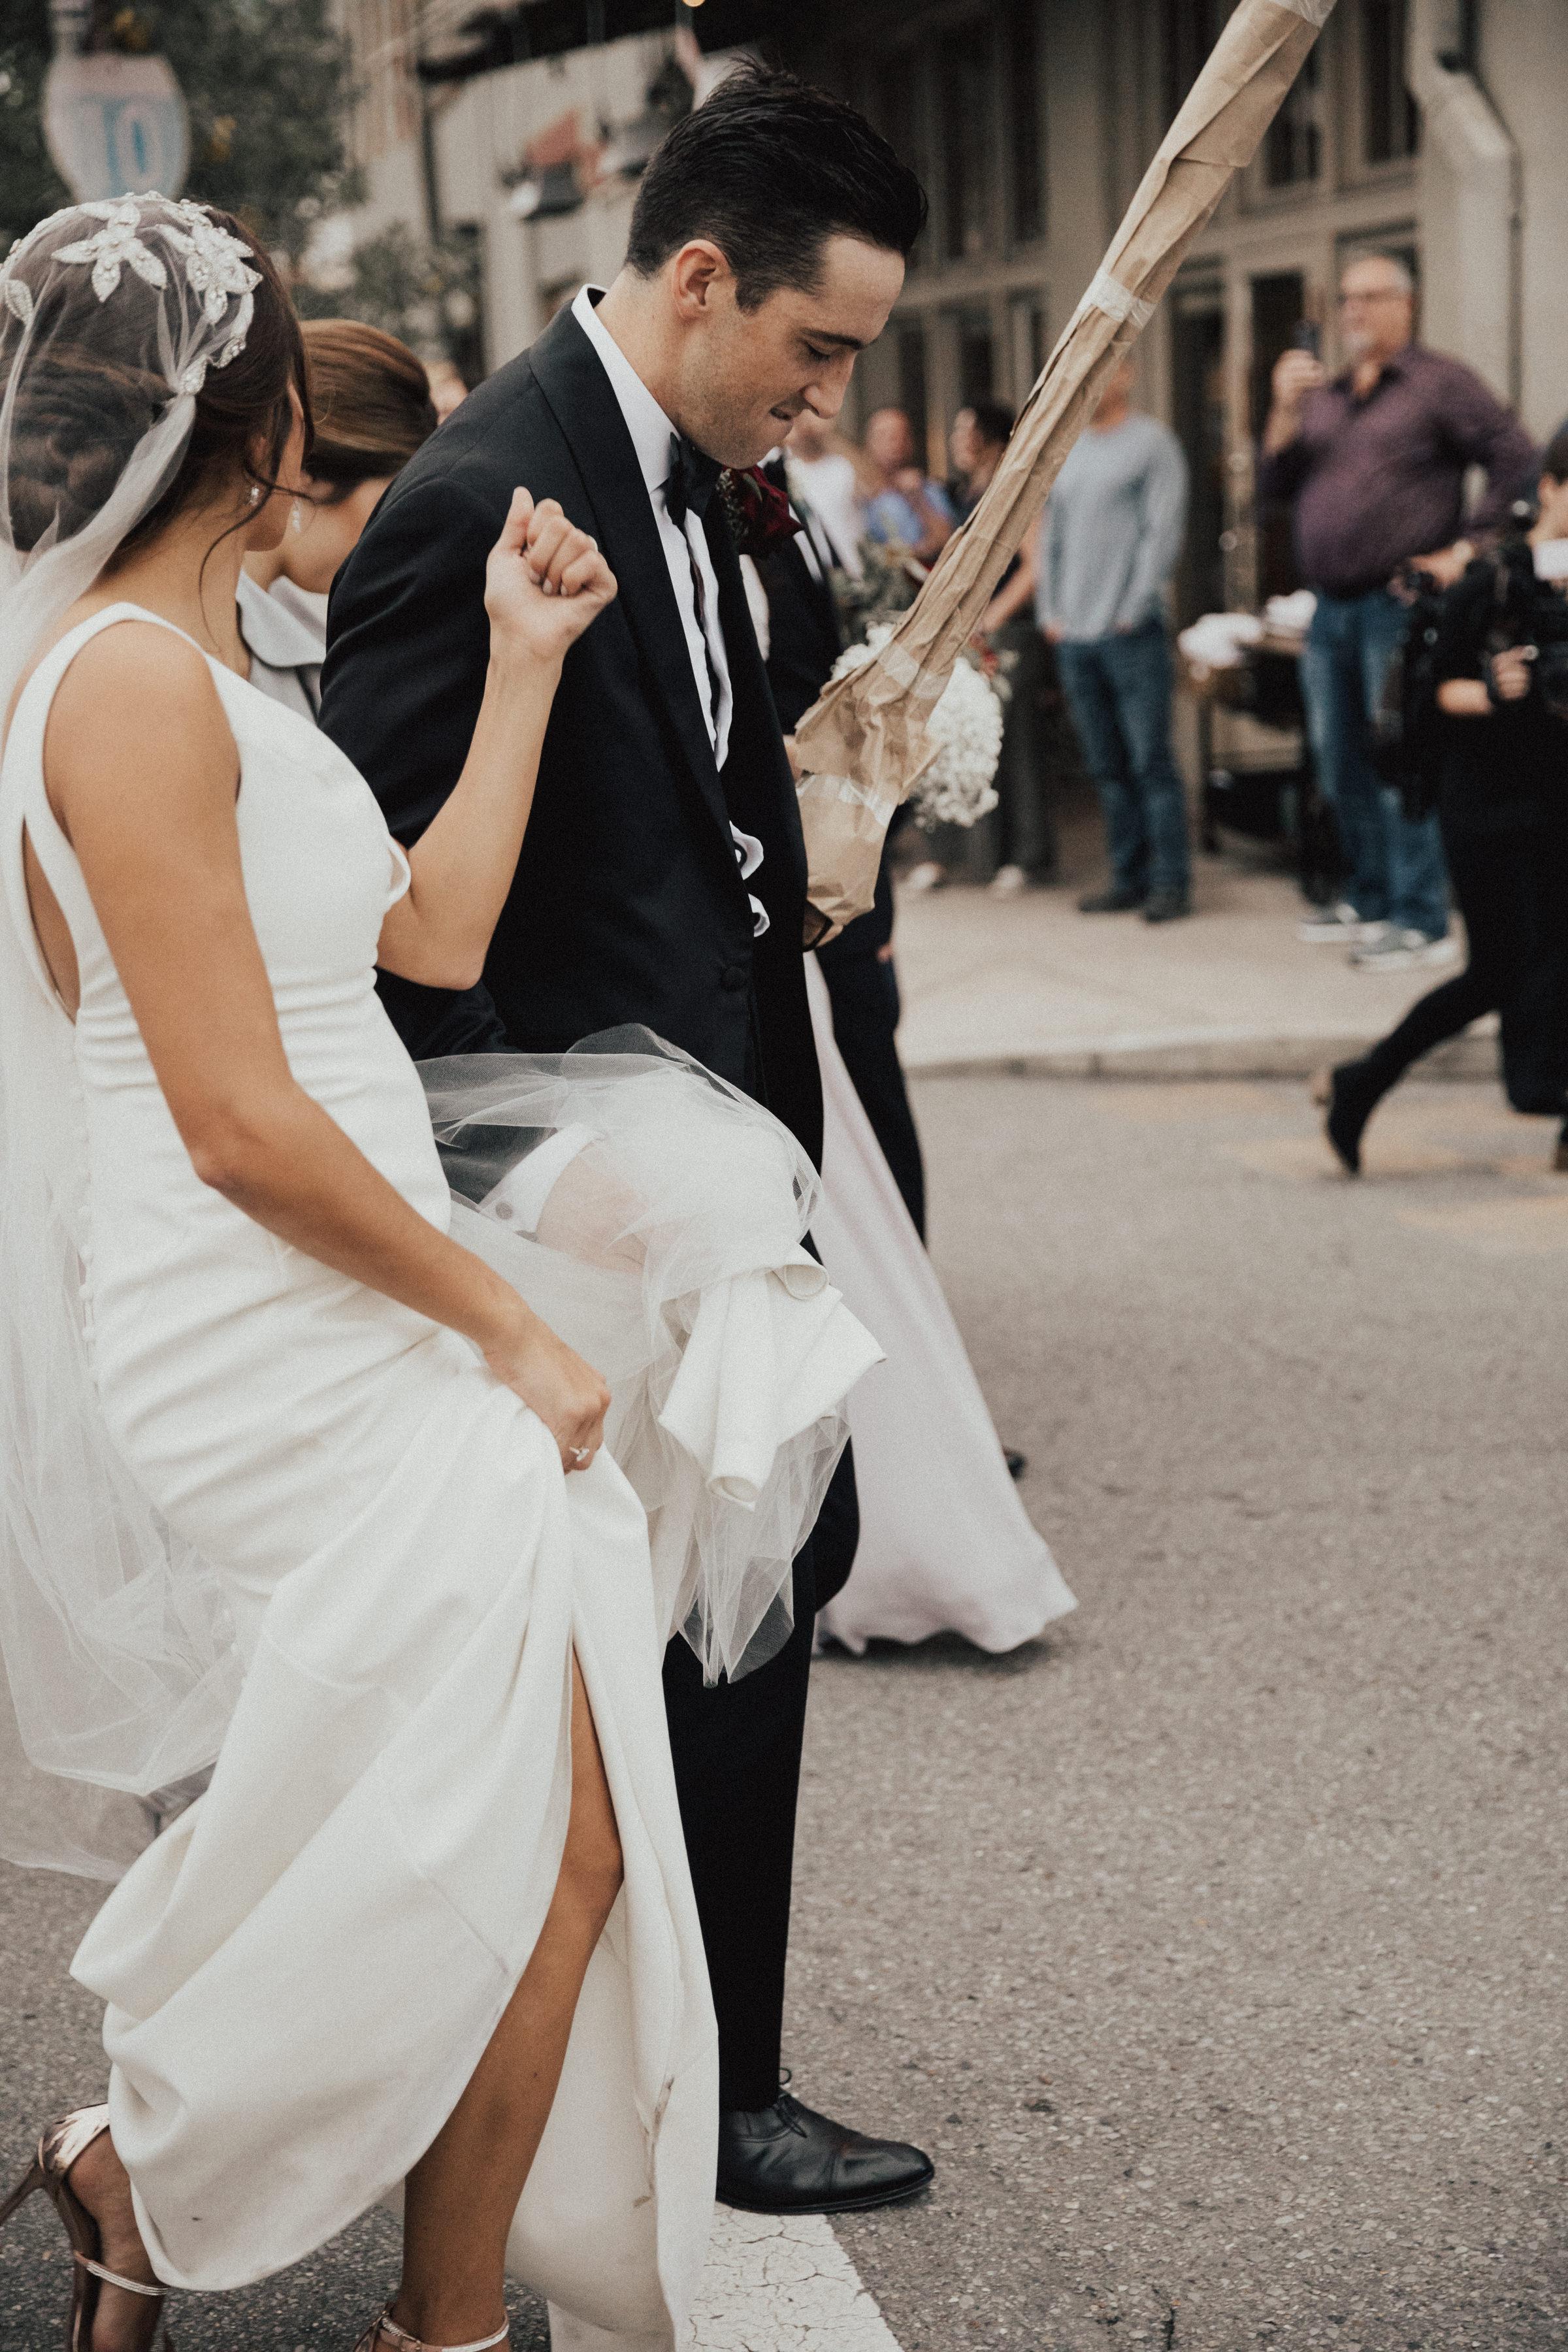 magners wedding (88 of 145).jpg